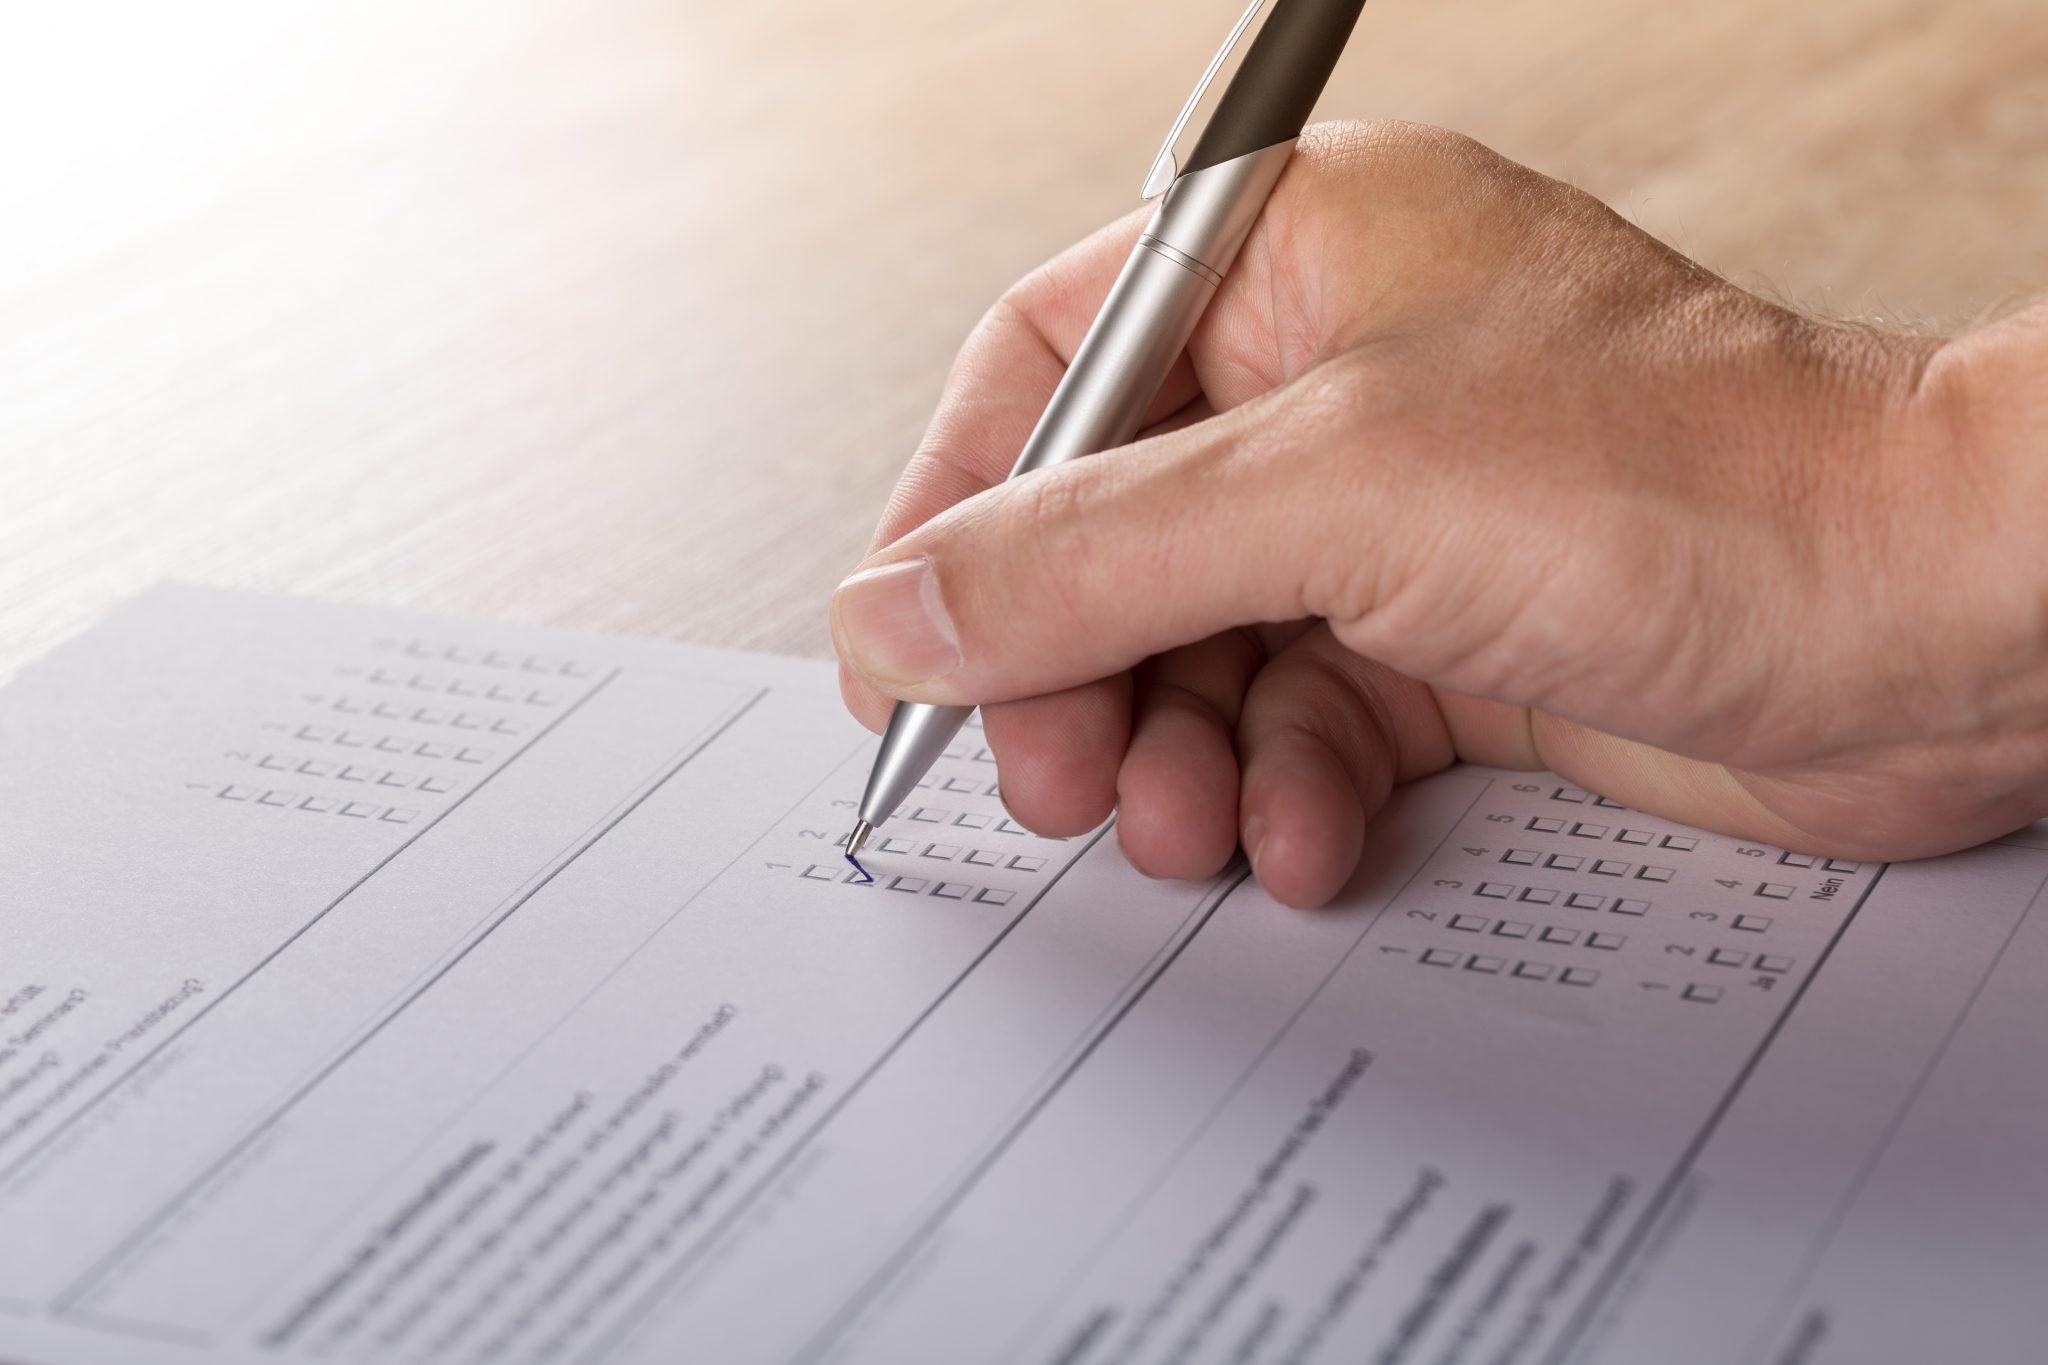 Survey sheet